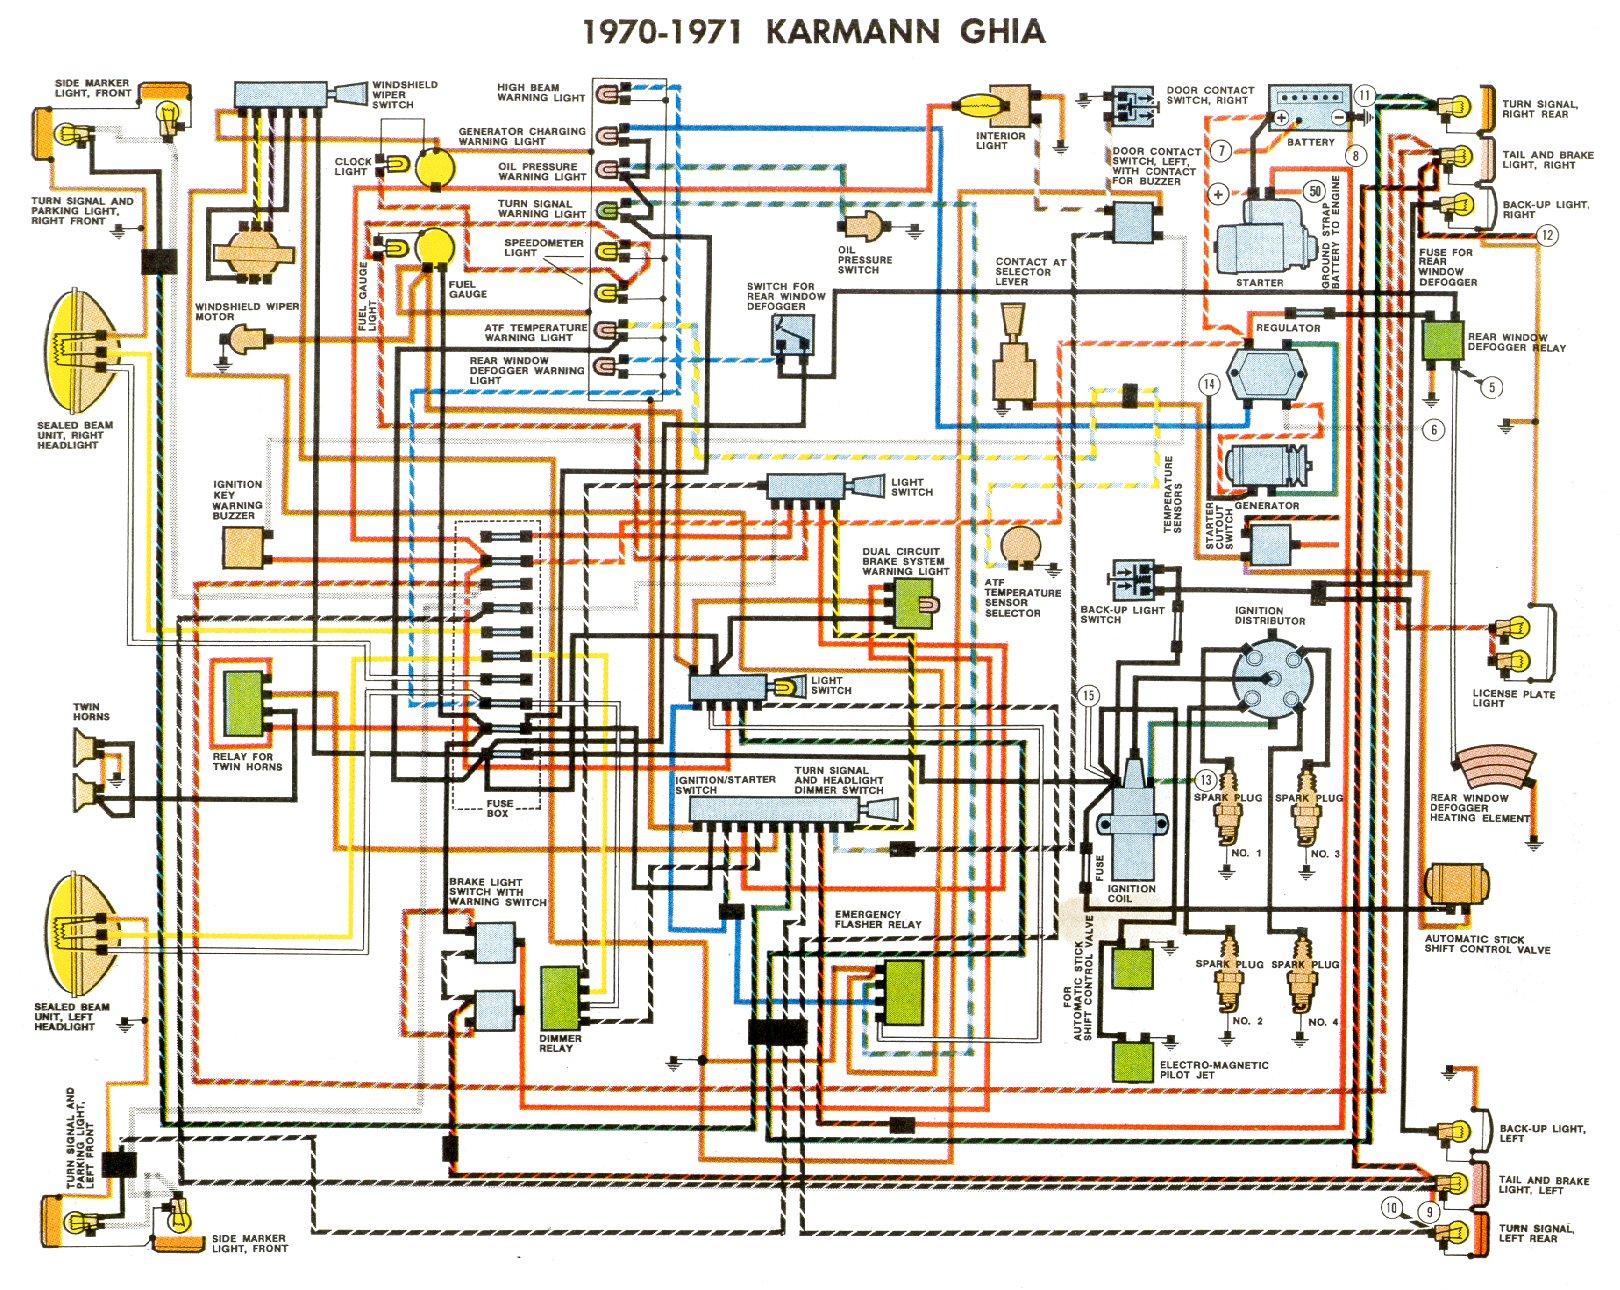 bluebird bus wiring diagram electrical residential diagrams blue bird parts